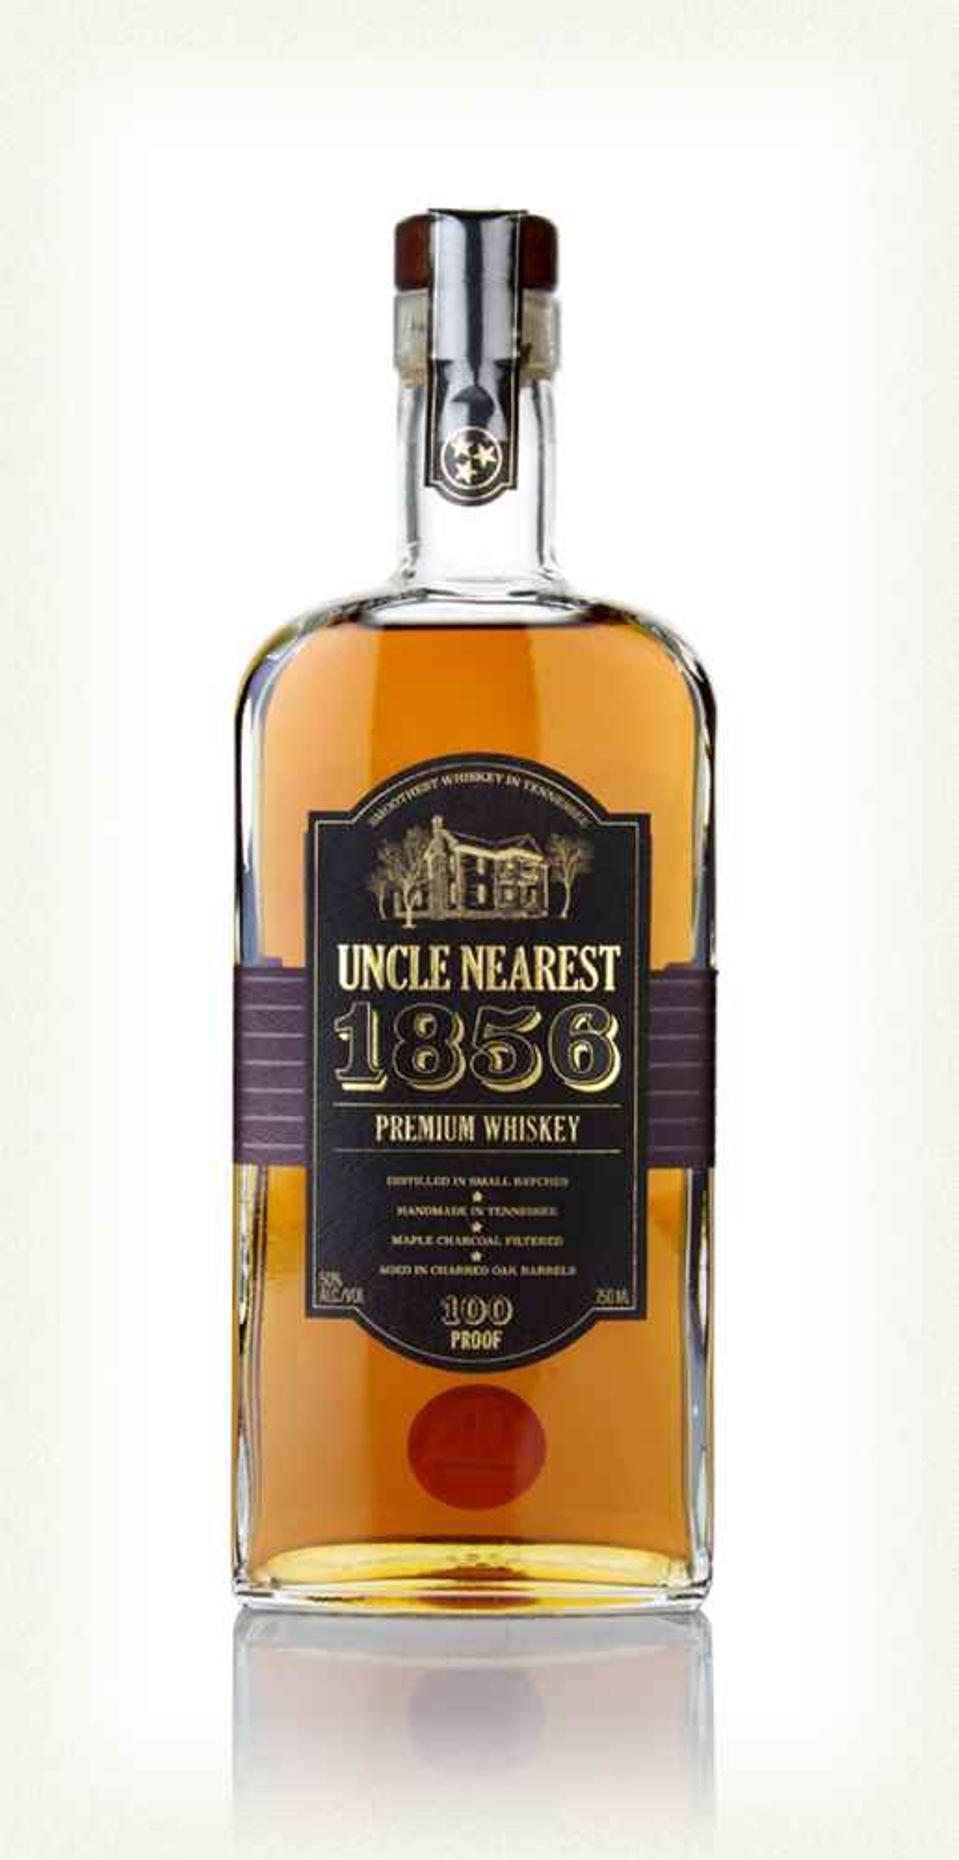 Uncle Nearest Premium Whiskey